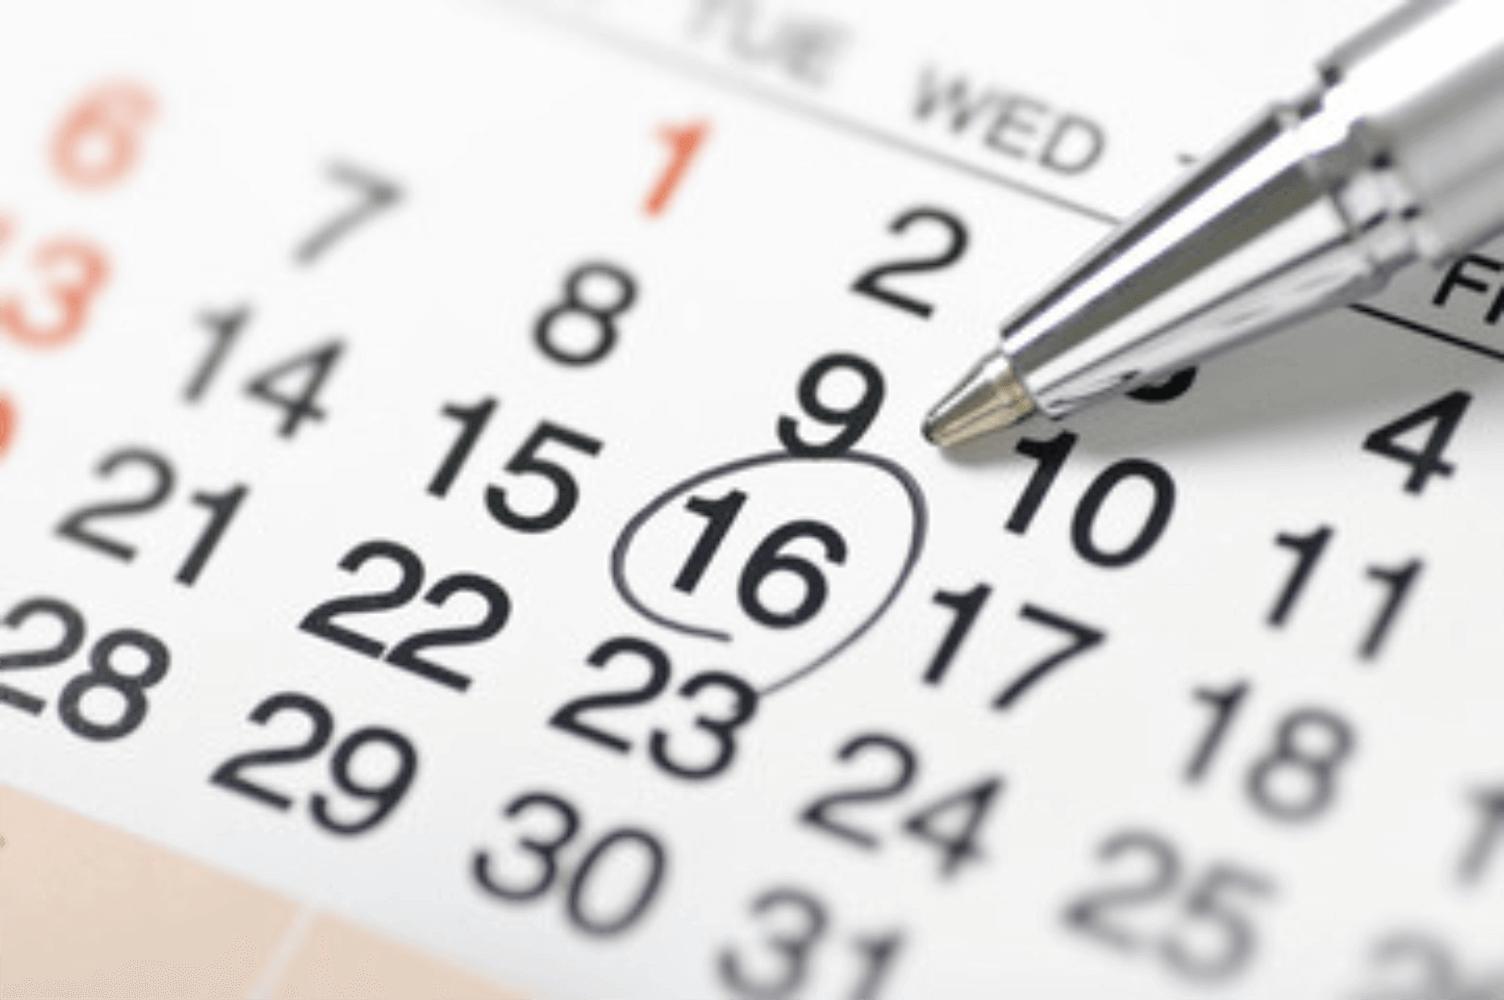 Decide Event Date